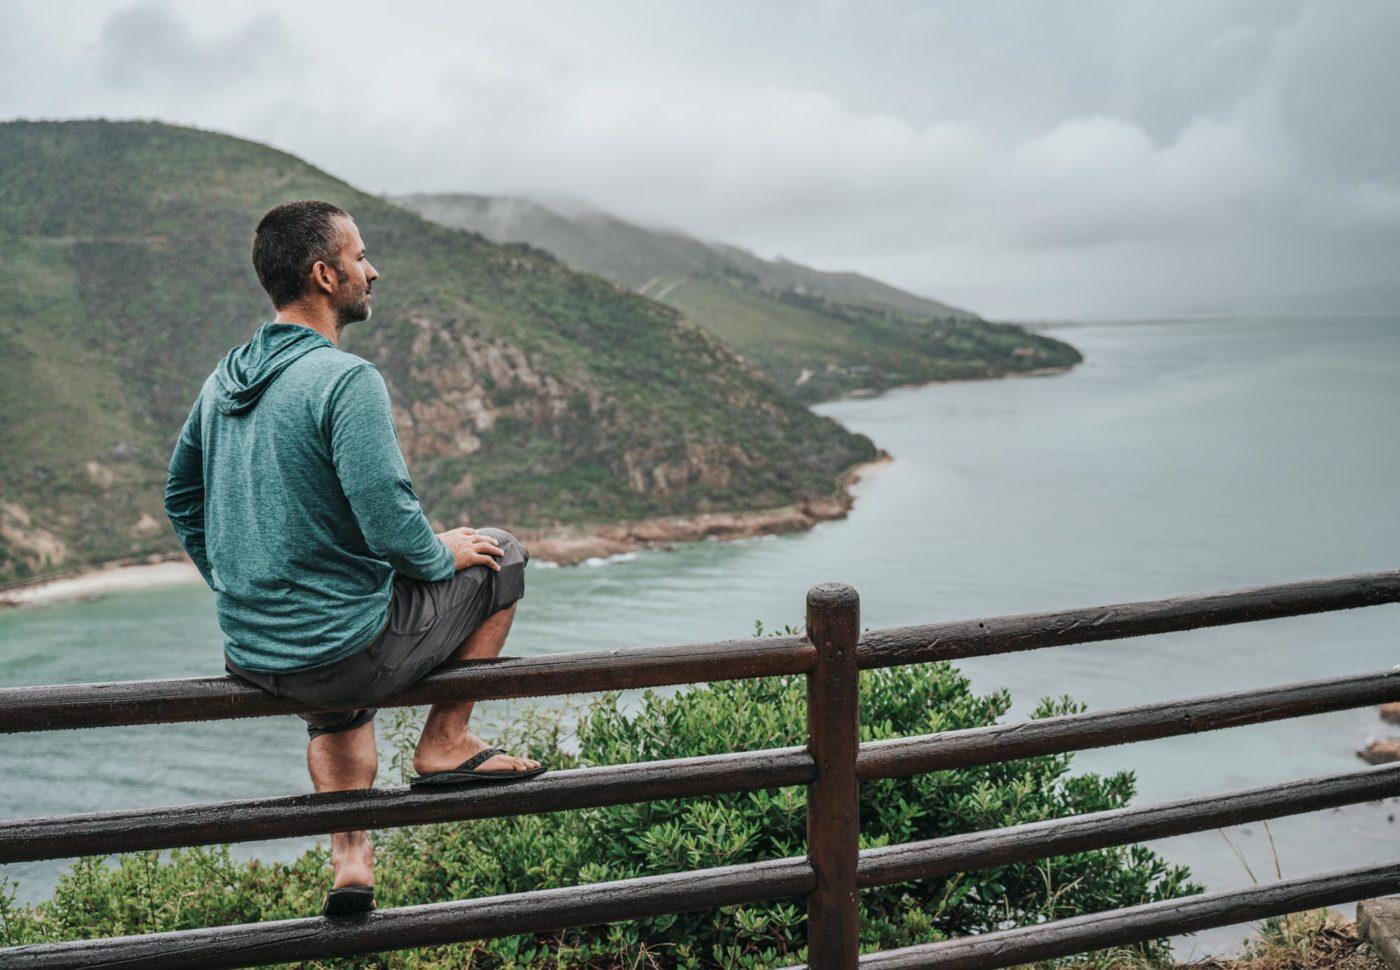 Overlooking Knysna Bay from Knysna Heads